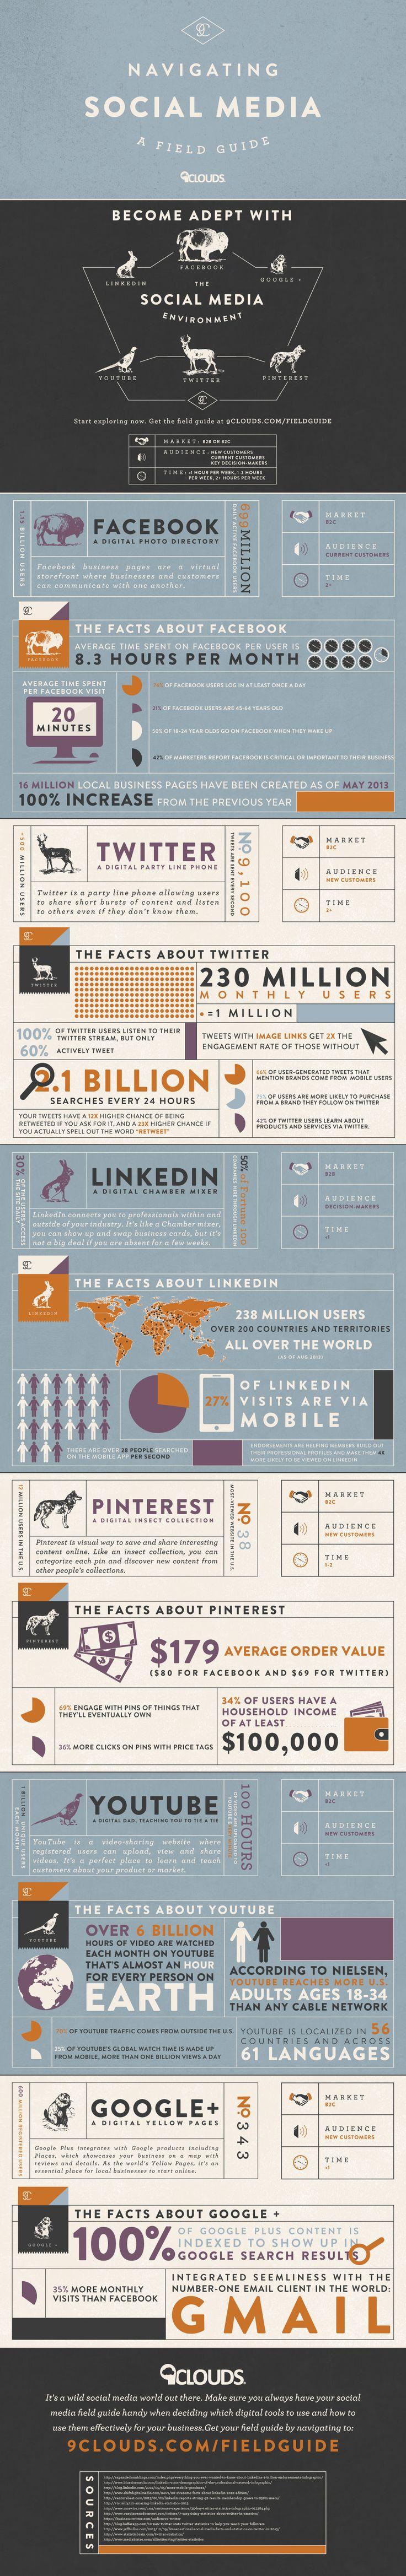 Guide to Social Networks SocialMedia Infographic 88